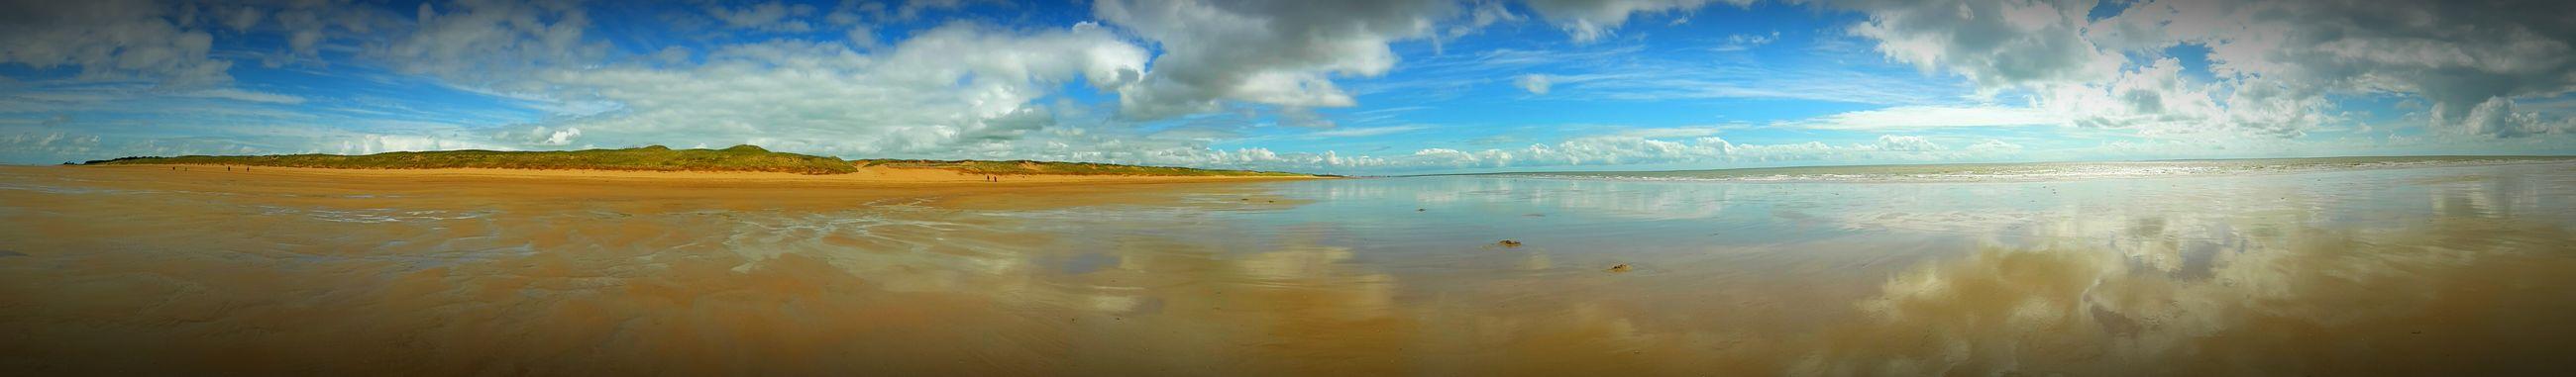 Beach Sunshine Panorama Sea Samsungphotography Color Of Life Vacation Reflection Low Season Samsung